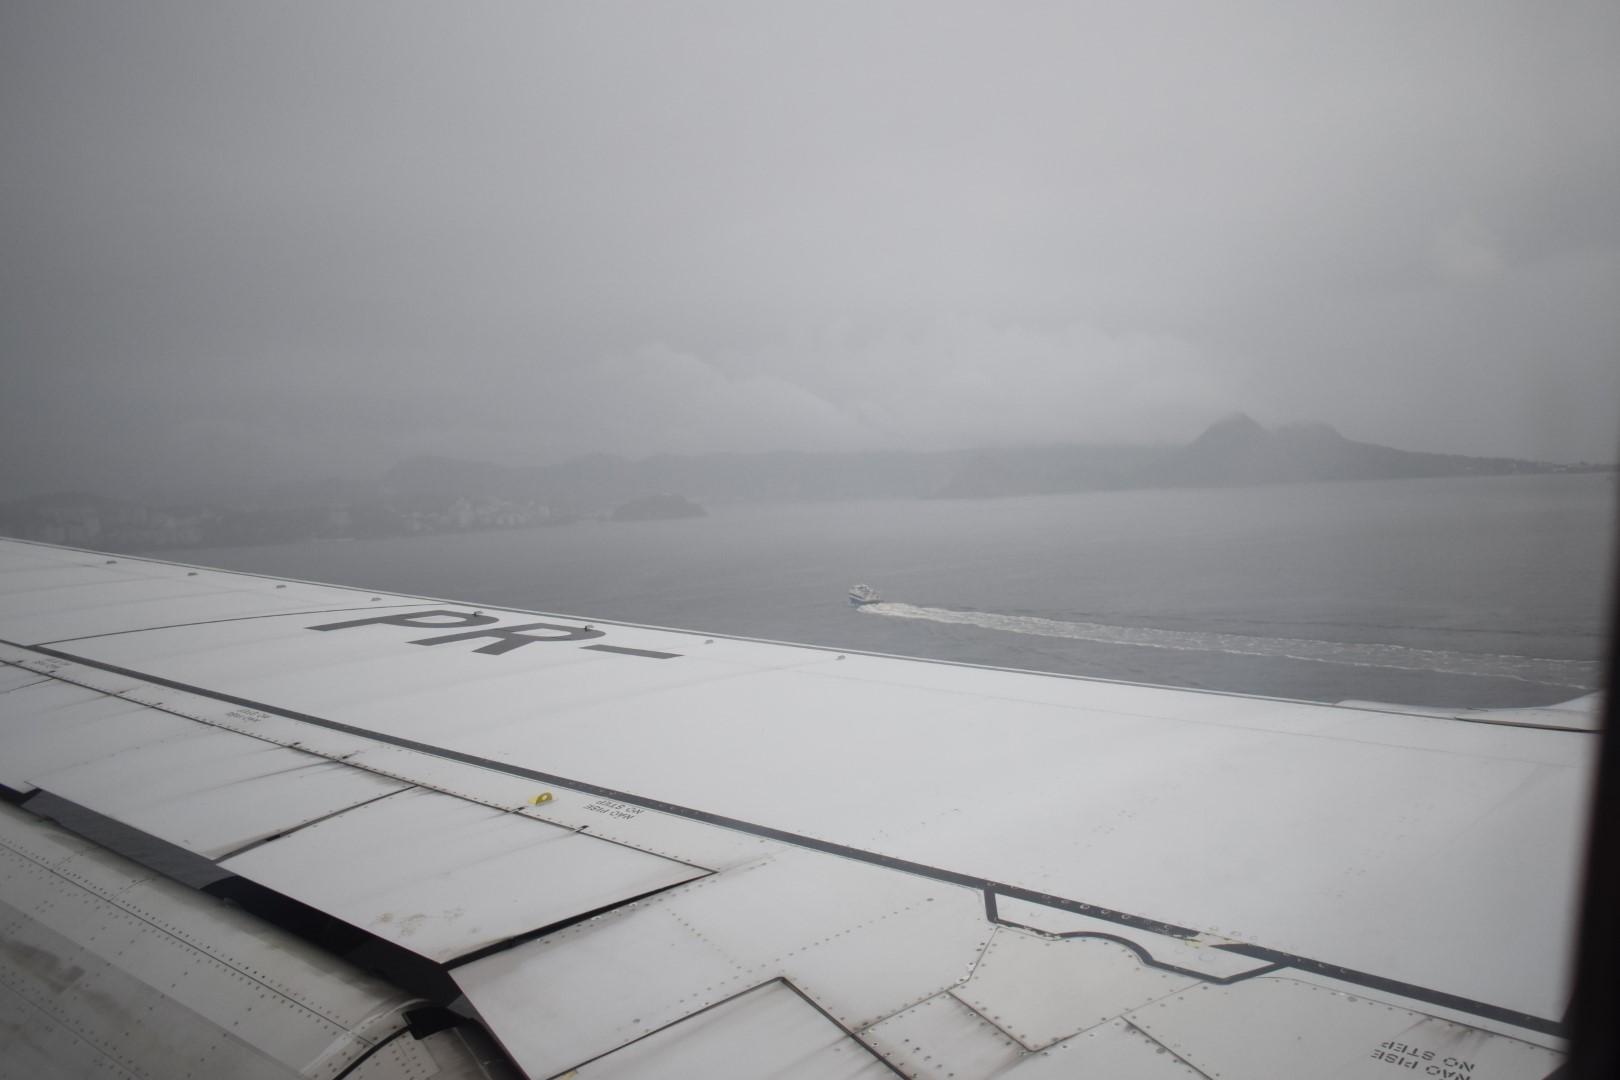 São Paulo to Rio de Janeiro, landing in Santos Dumont